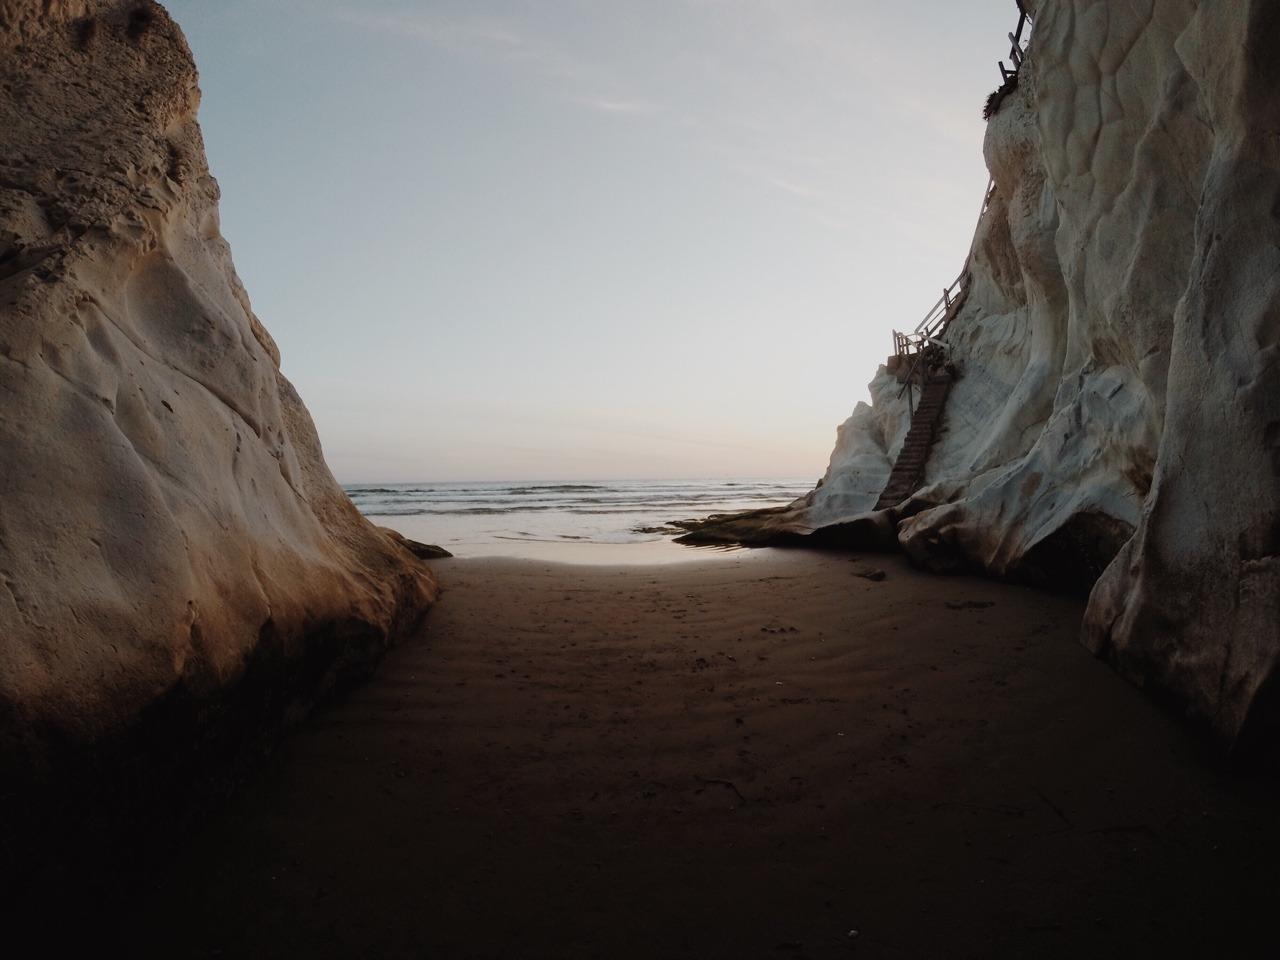 Caves at Pismo Beach, CA @summermalia